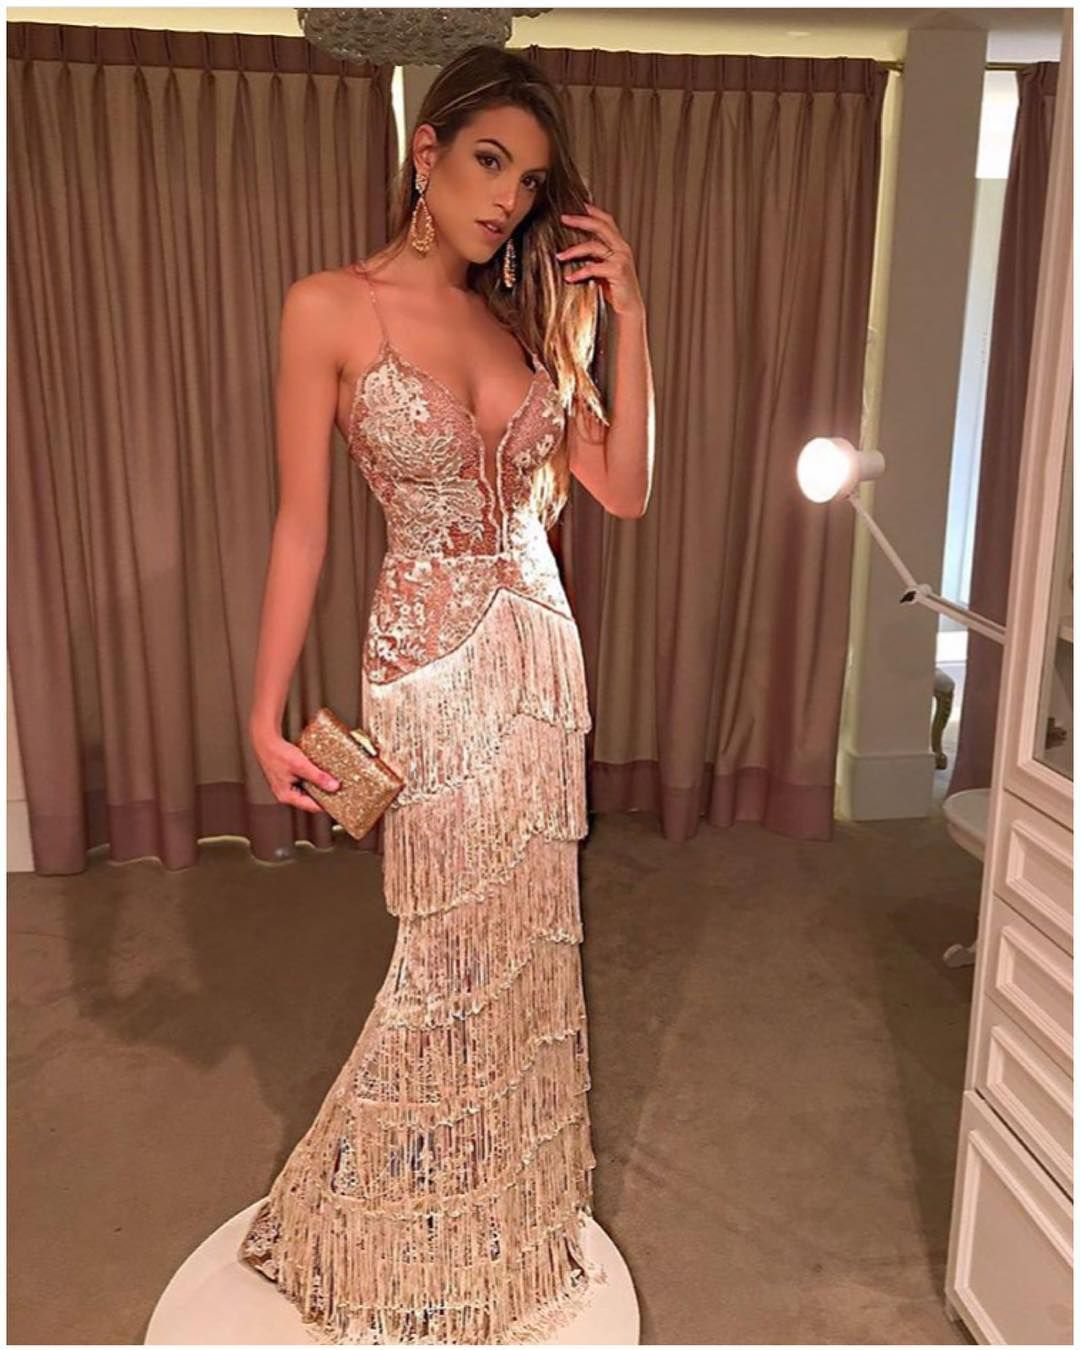 Vestido de Festa Dourado/Nude Sereia - Fino Traje Moda Festa